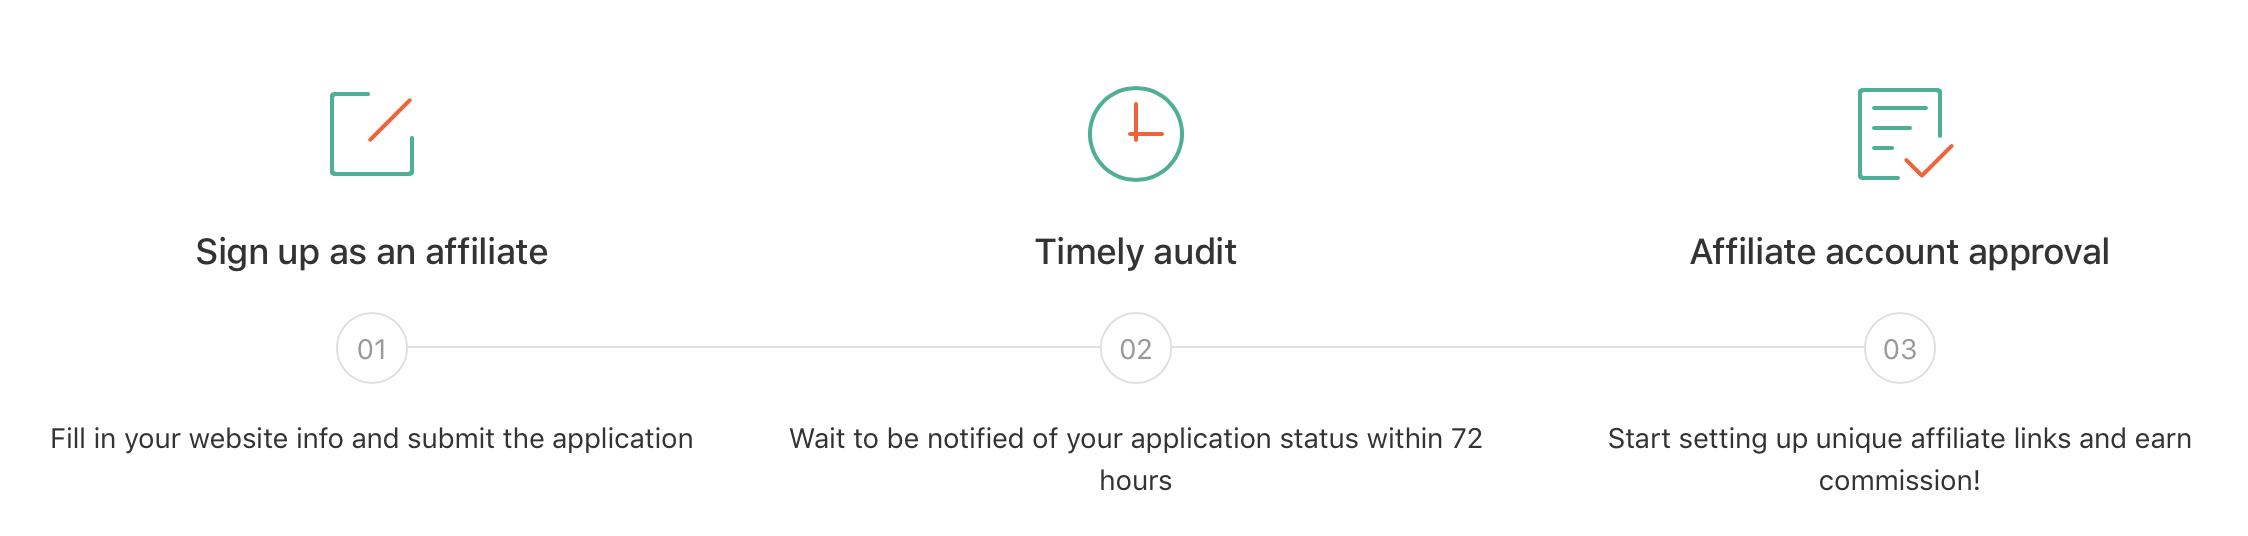 Screenshot 2019-04-25 at 1.01.52 PM